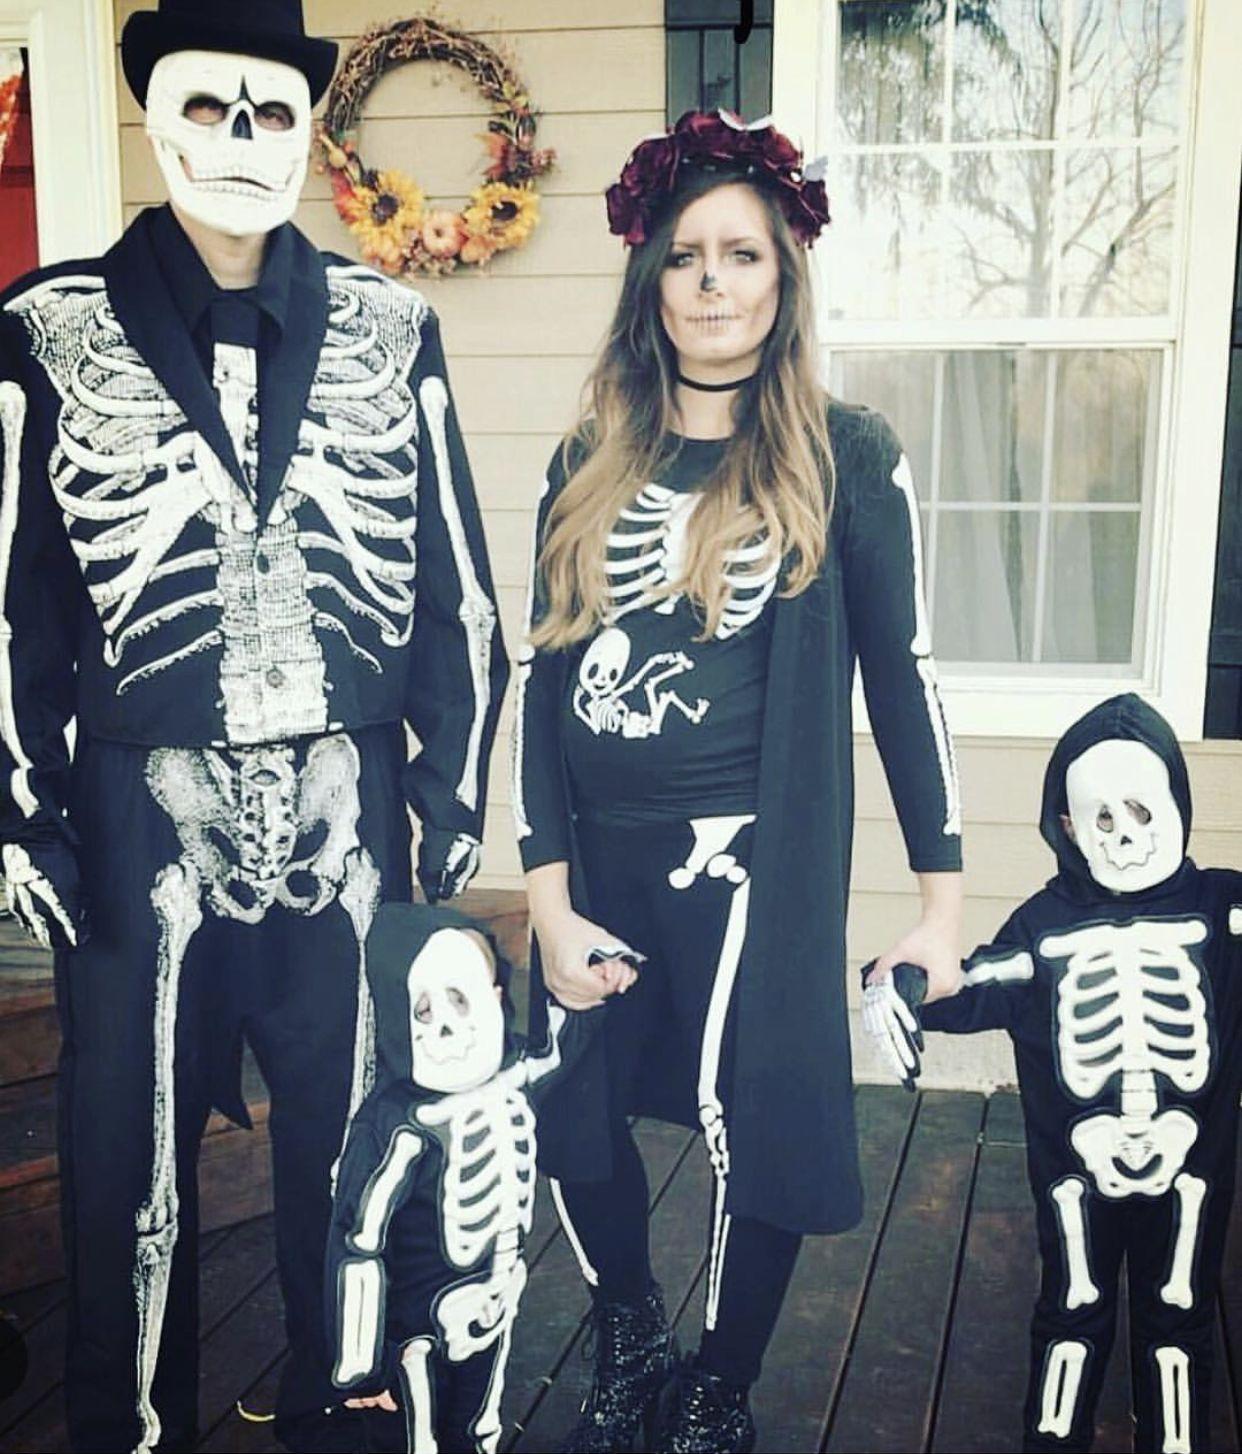 Prego Halloween Party 2020 Family Halloween Costumes | Family halloween costumes, Pregnant